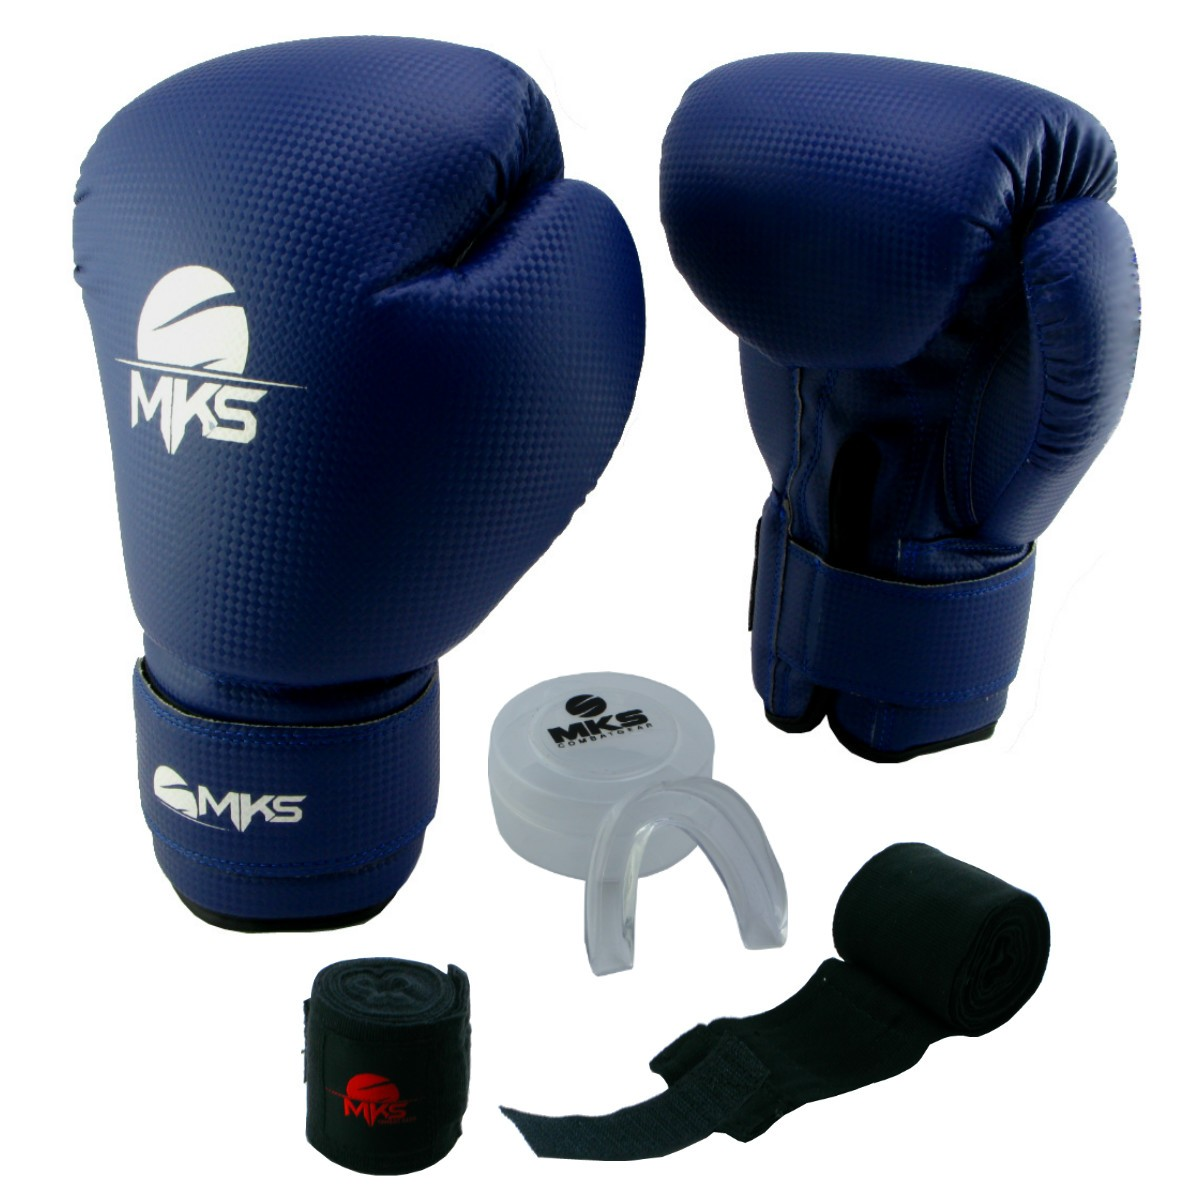 Luva de Boxe Prospect MKS Blue 16 oz + Protetor Bucal + Bandagem